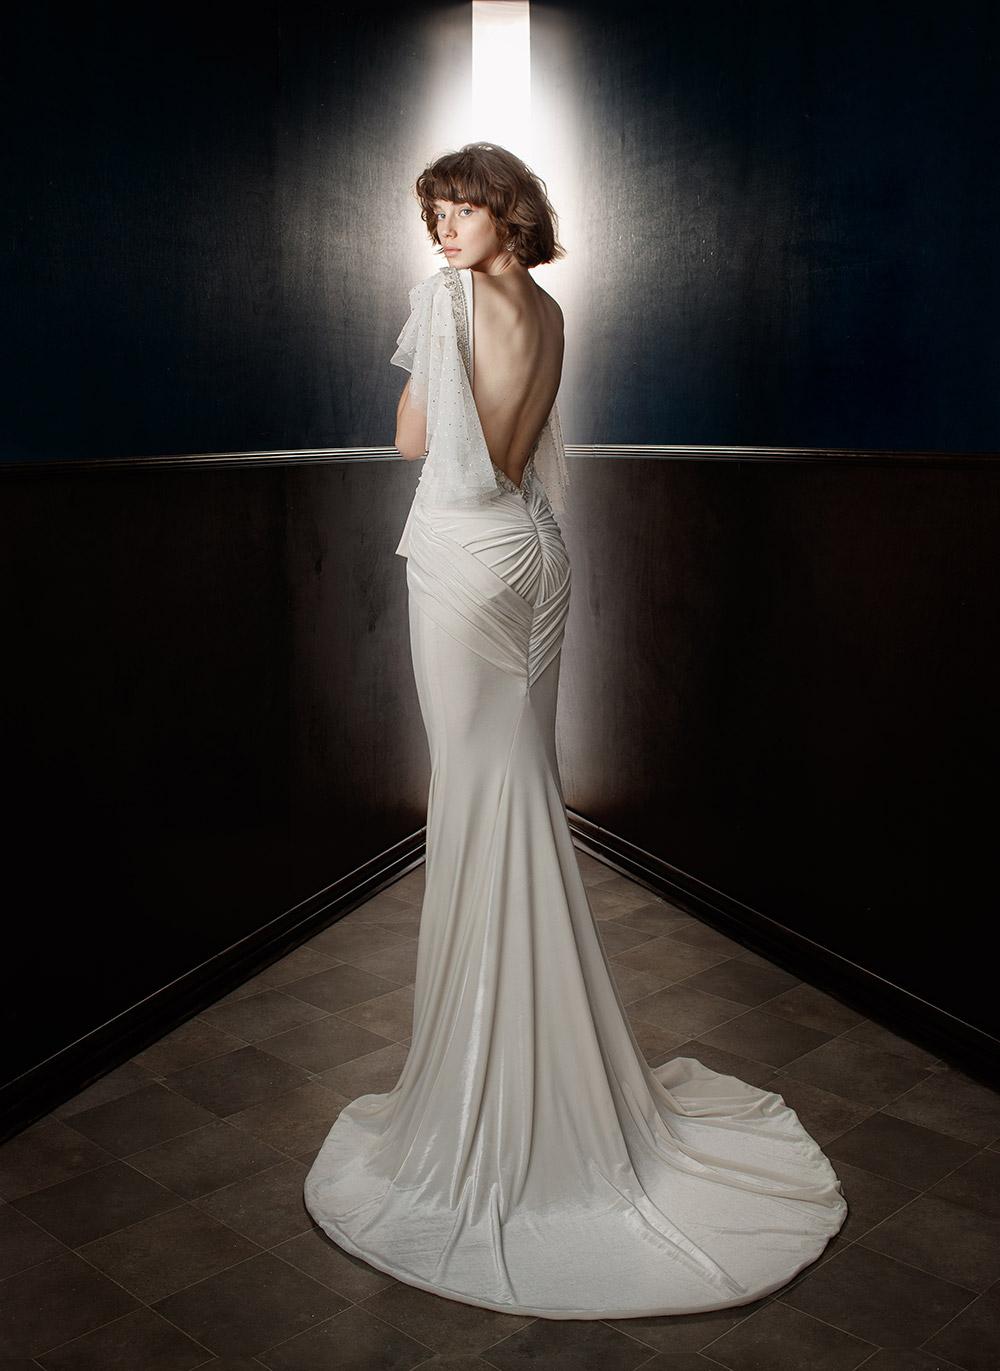 Velvet - Galia Lahav Spring 2018 Bridal Collection. www.theweddingnotebook.com